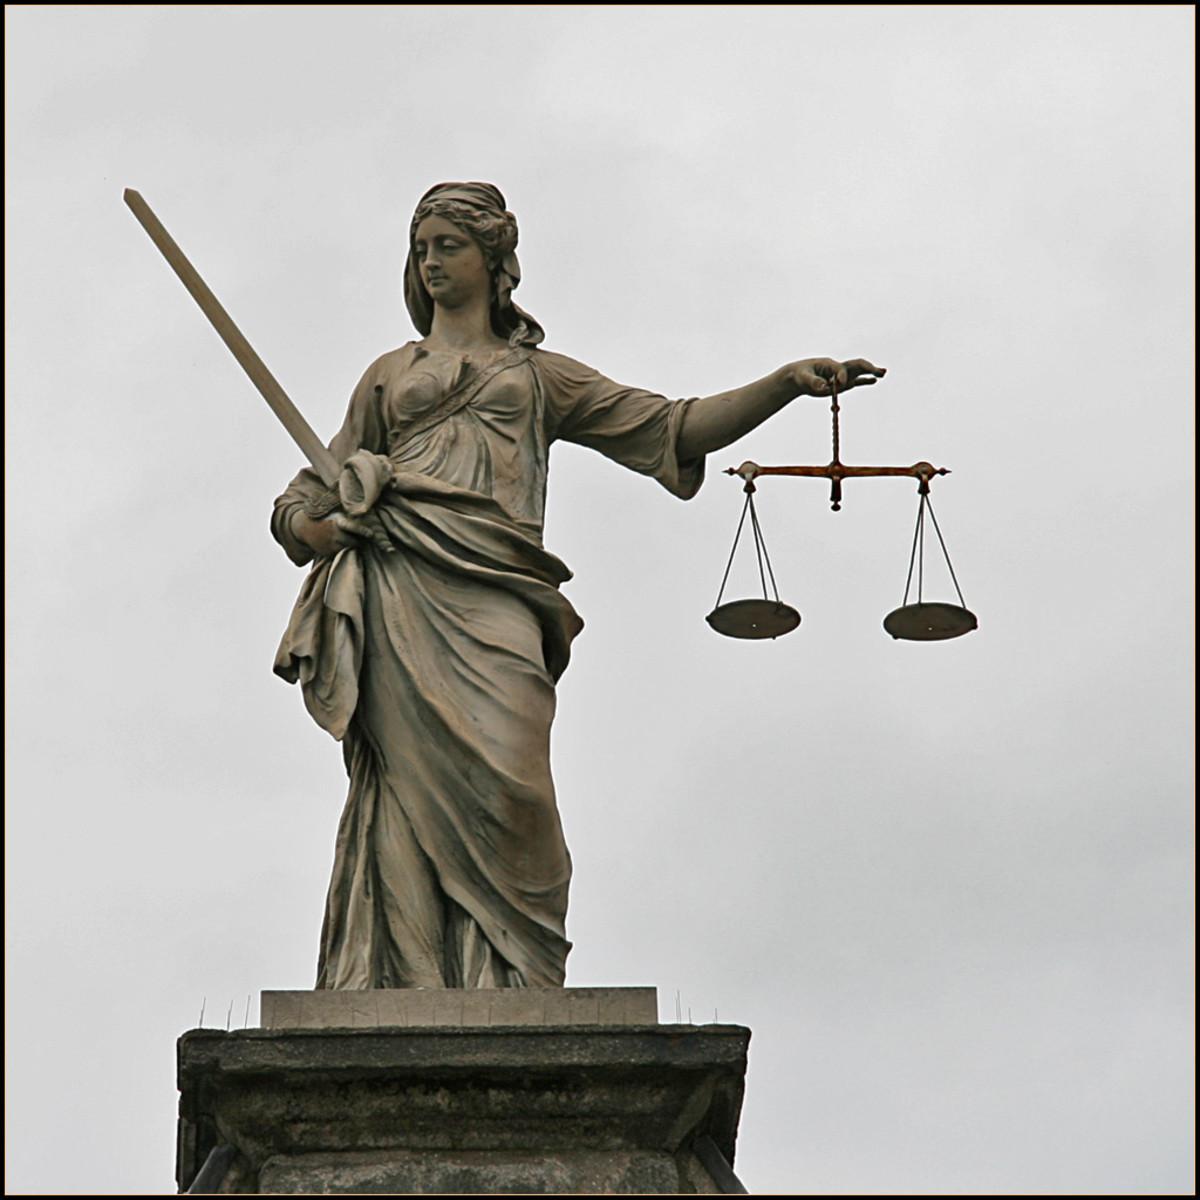 The Goddess Themis, goddess of justice, very similar to Nemesis